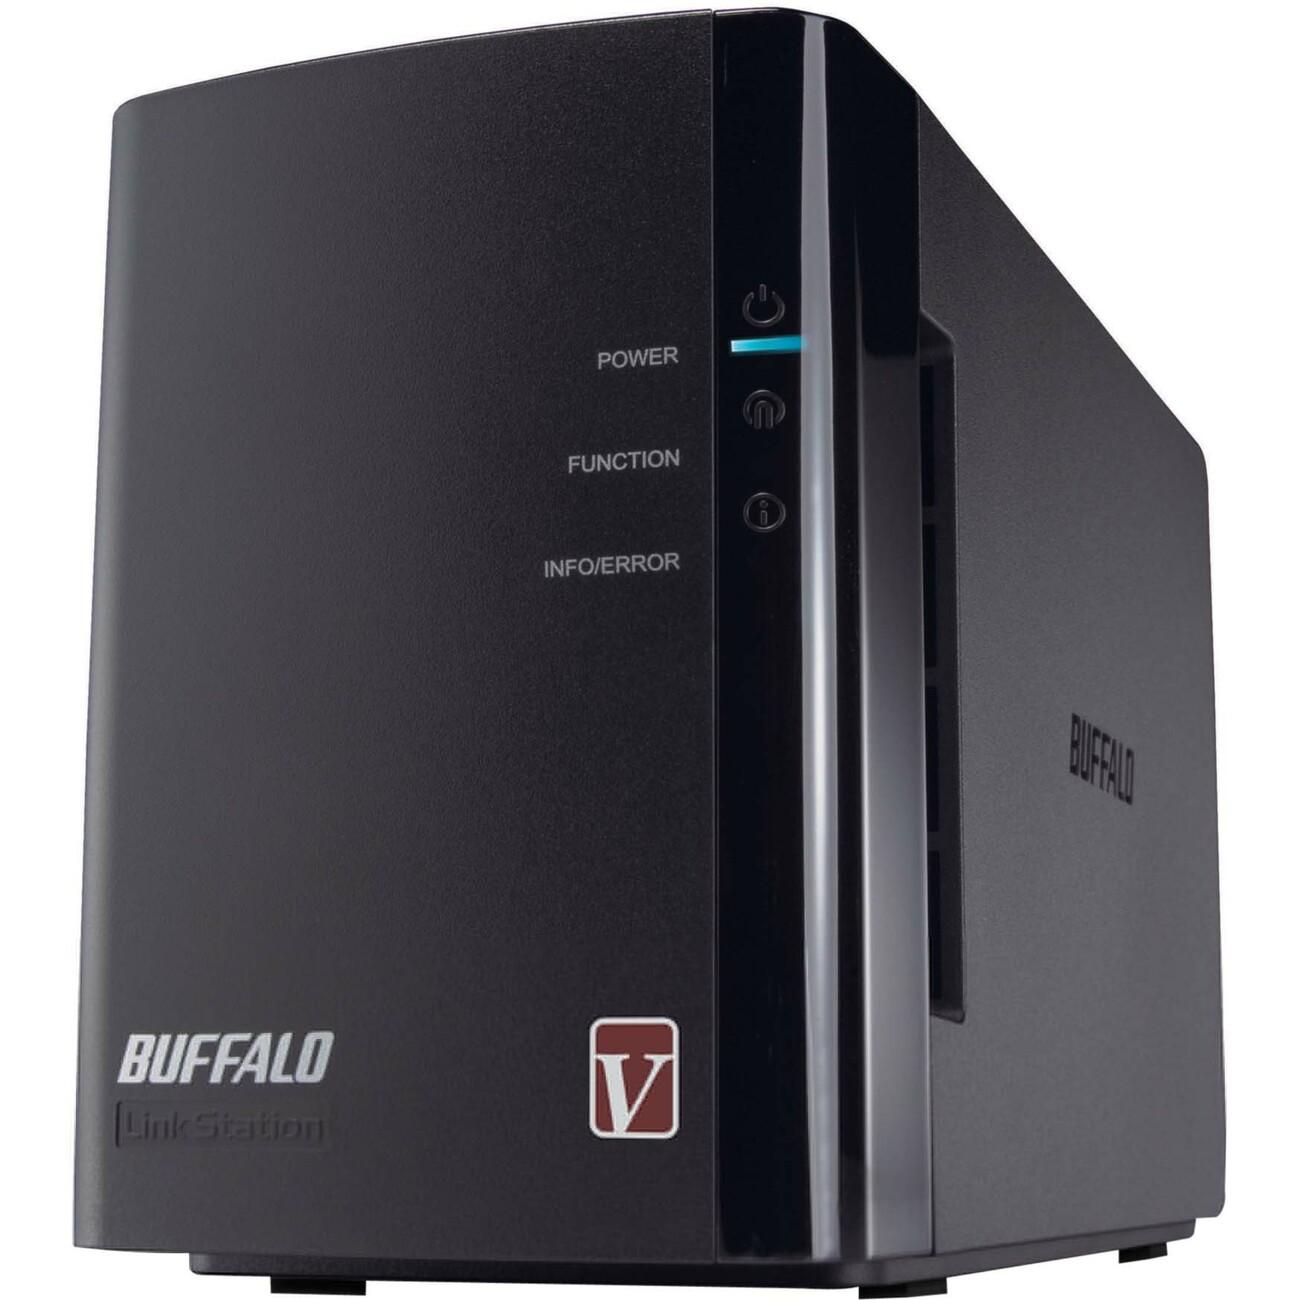 BUFFALO LS-WVL/E Diskless System Linkstation Pro Duo High Performance  2-drive RAID Network Storage - Newegg com